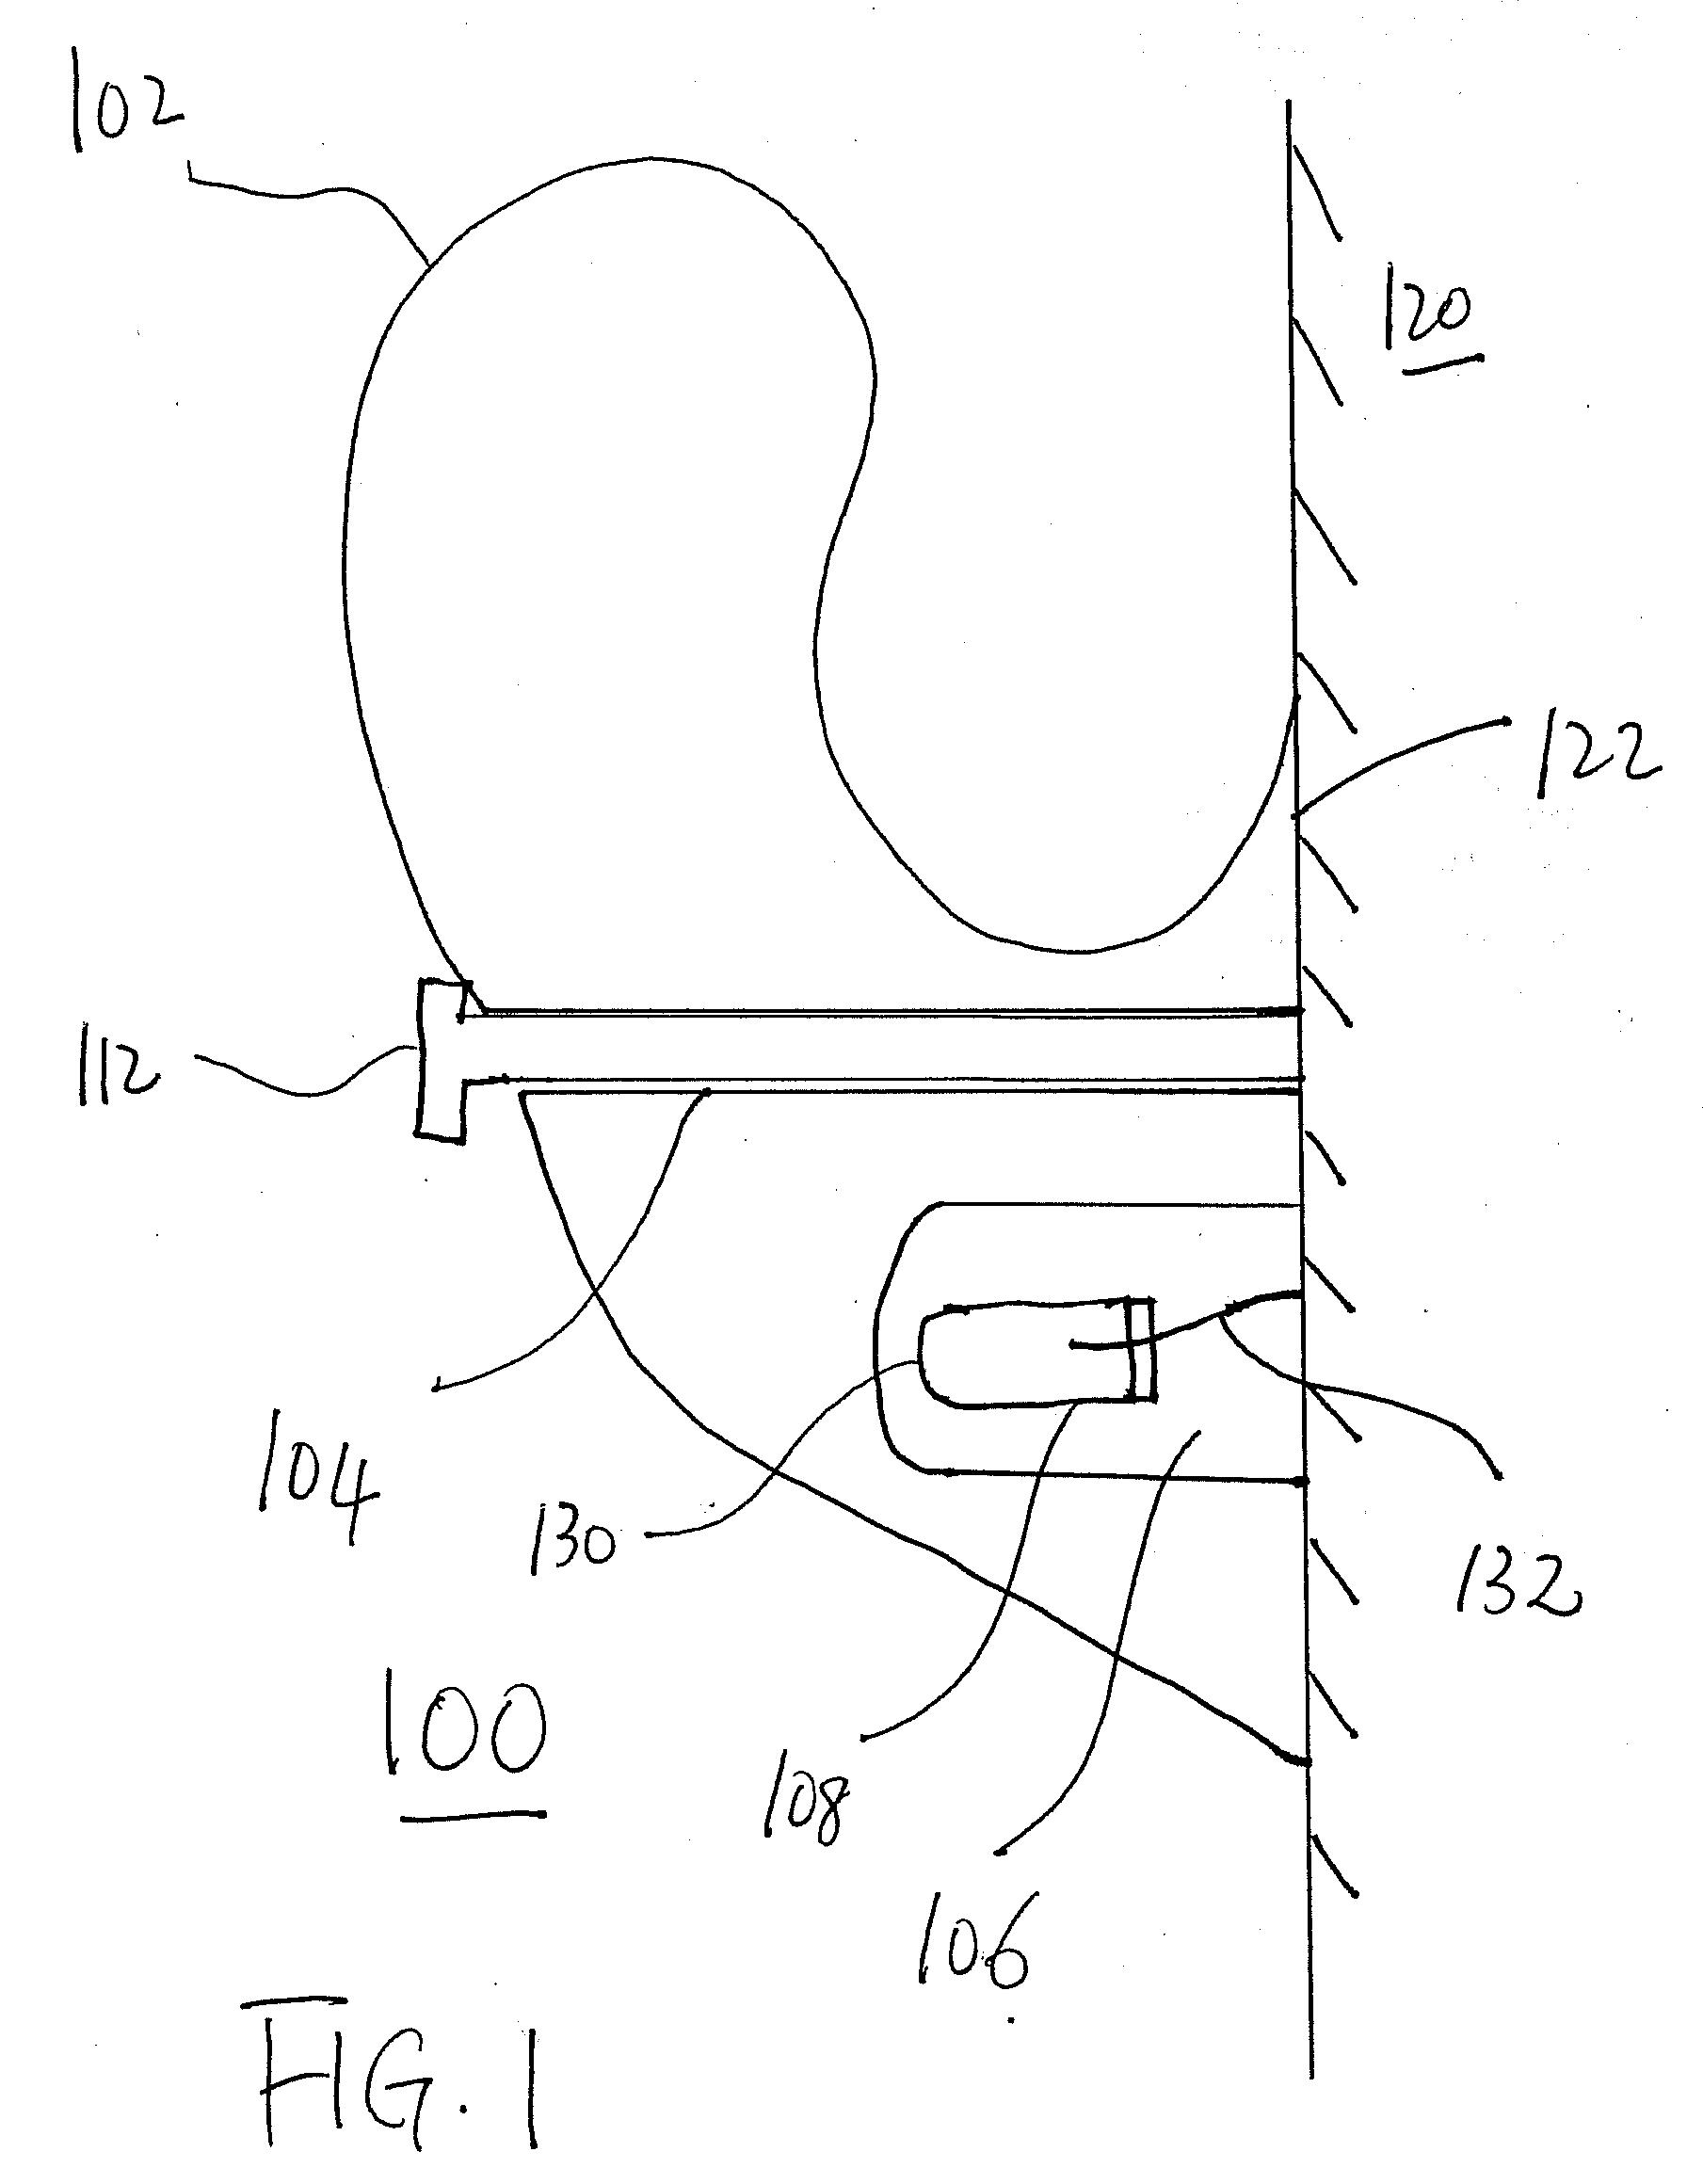 Climbing Gear Patents